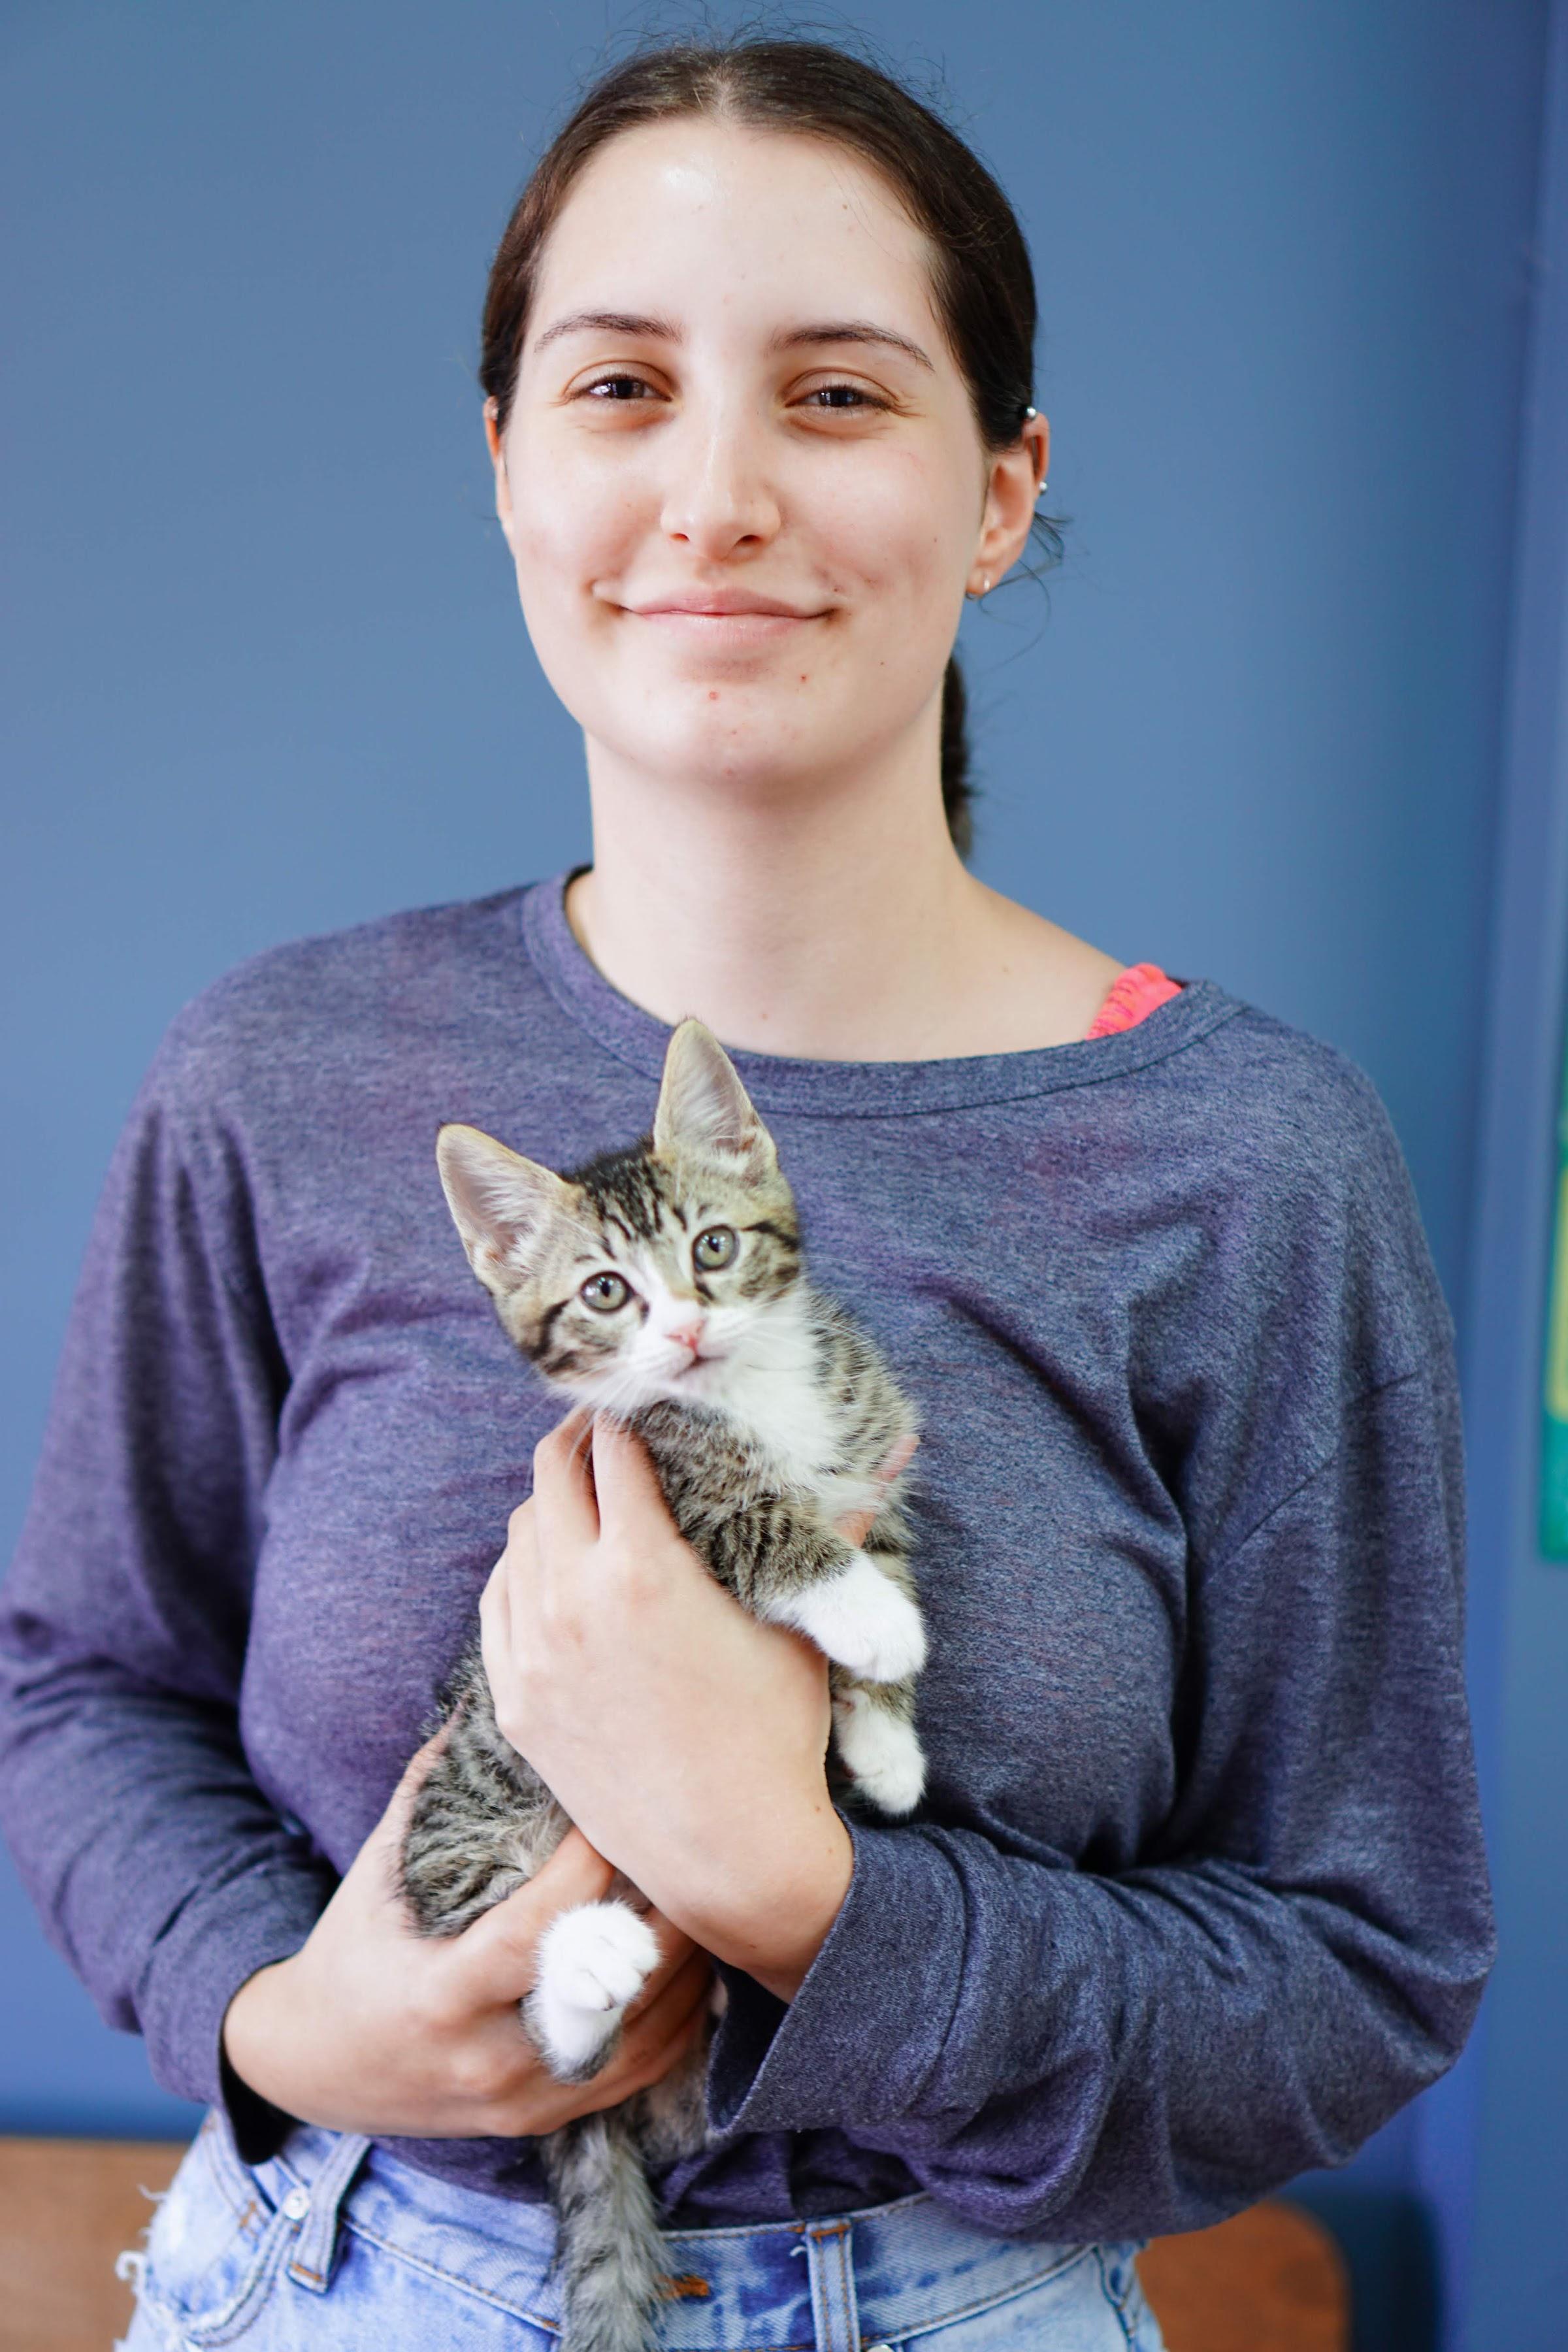 Vet nurse student Casey with cheeky tabby kitten